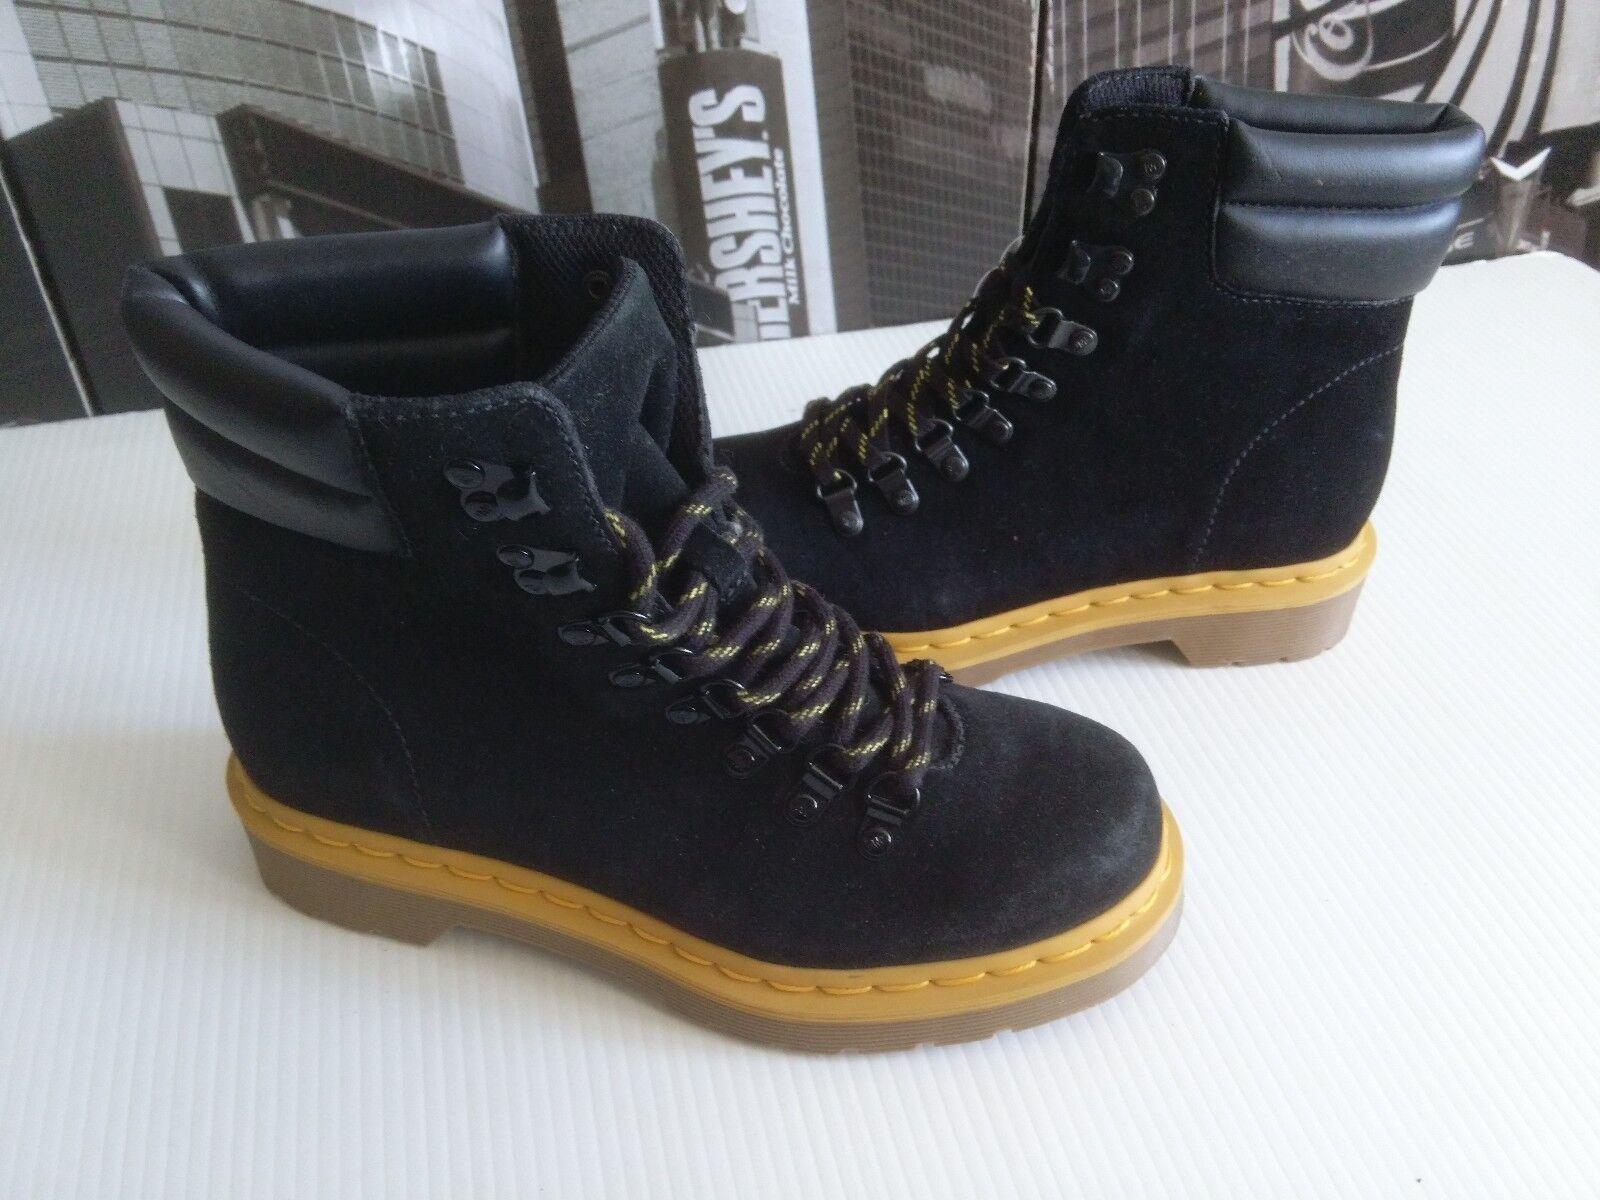 Dr. Martens Iris Gamuza Mujer Cuero Negro botas con Cordones para Mujer Gamuza US 10 UK 8 EU 42 beea6e